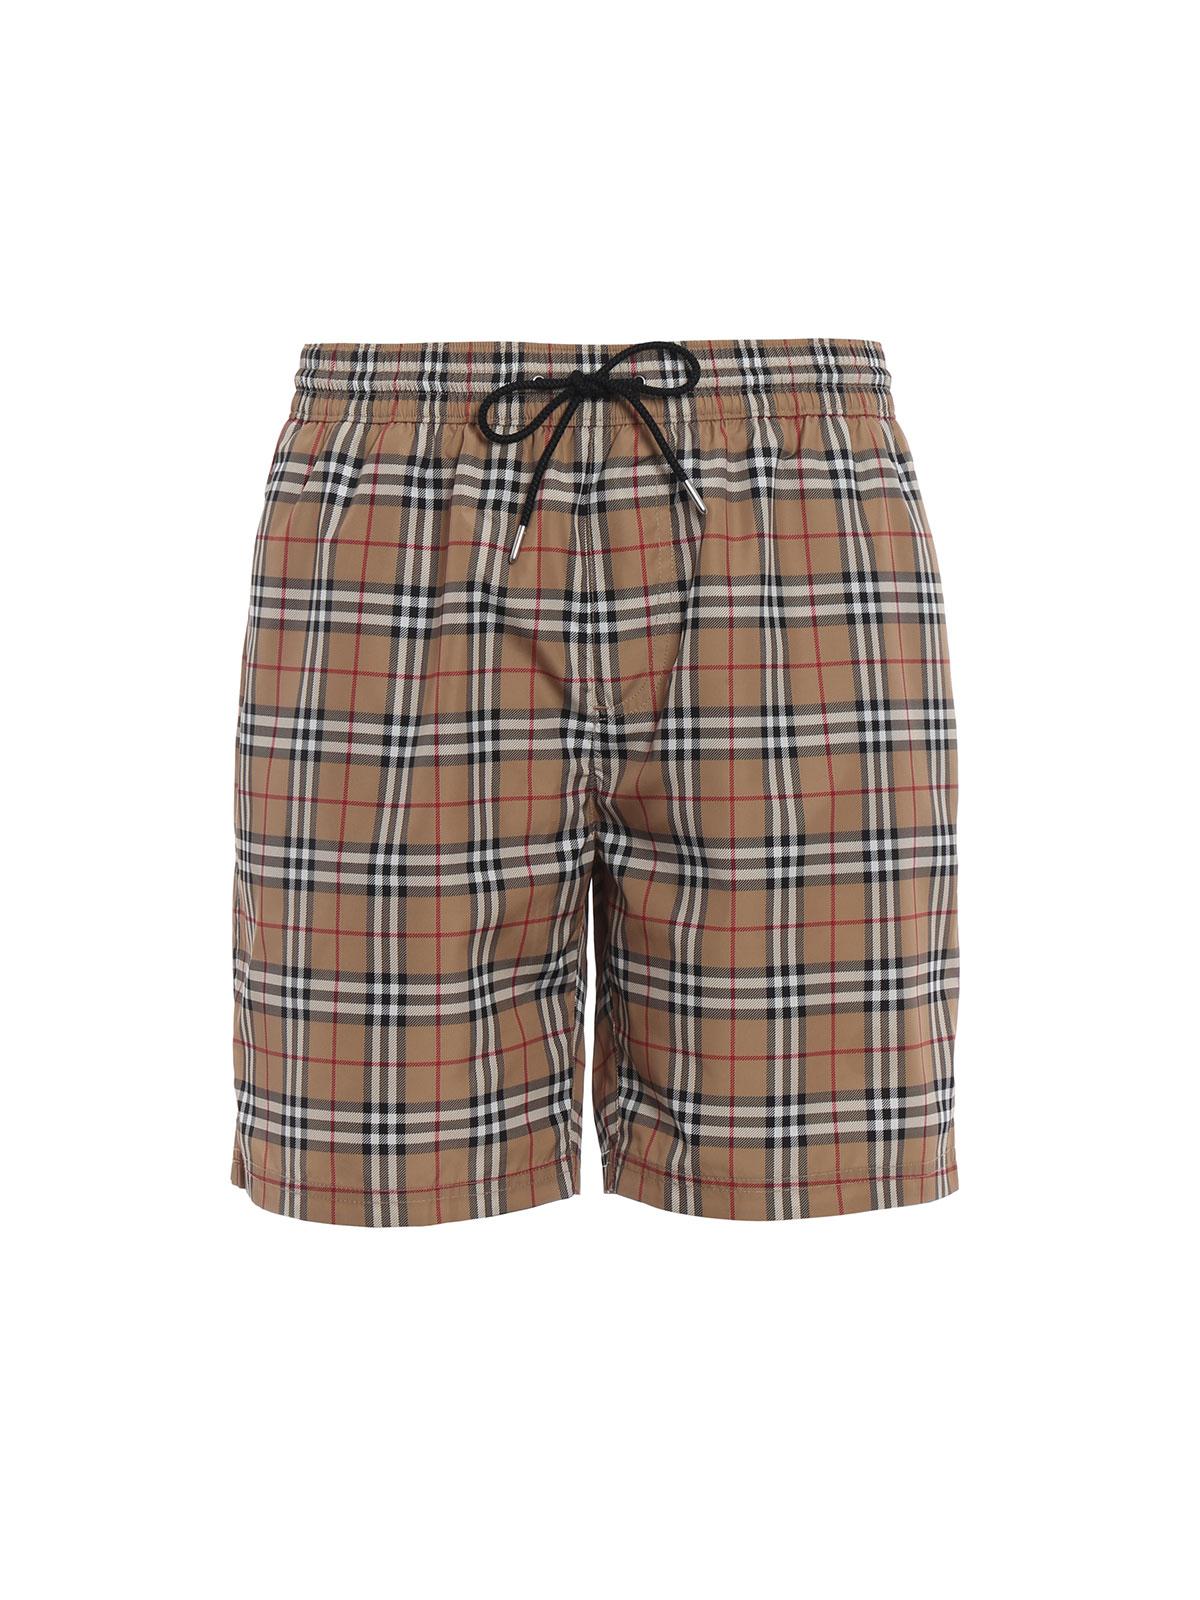 3a78df774b BURBERRY: Swim shorts & swimming trunks - Guildes beige Check swim shorts